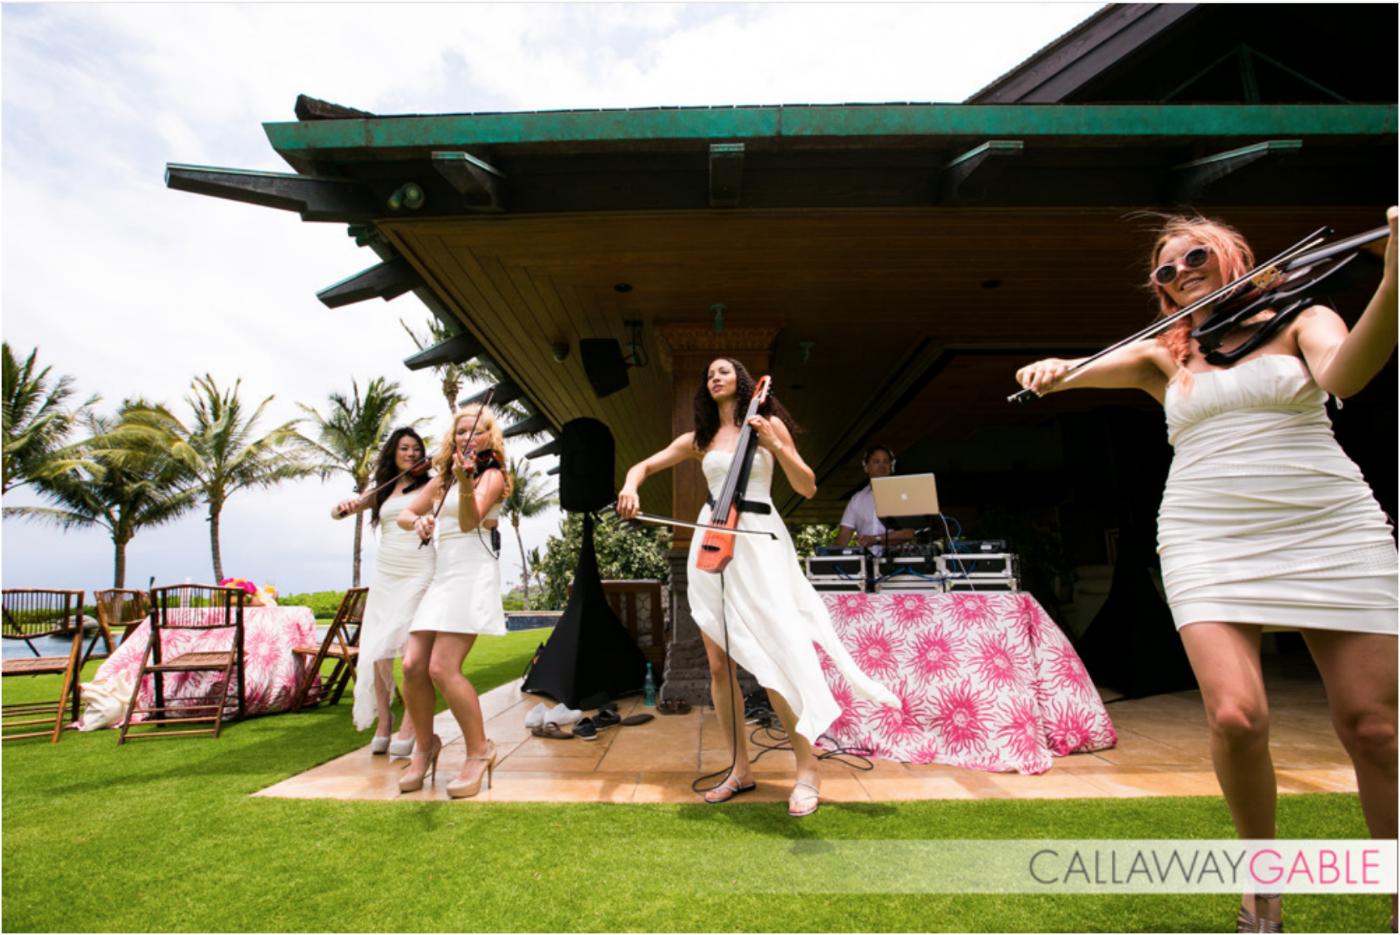 los-angeles-wedding-music-live-event-electric-violinist-string-quartet-DJ-maui-edm-3.png